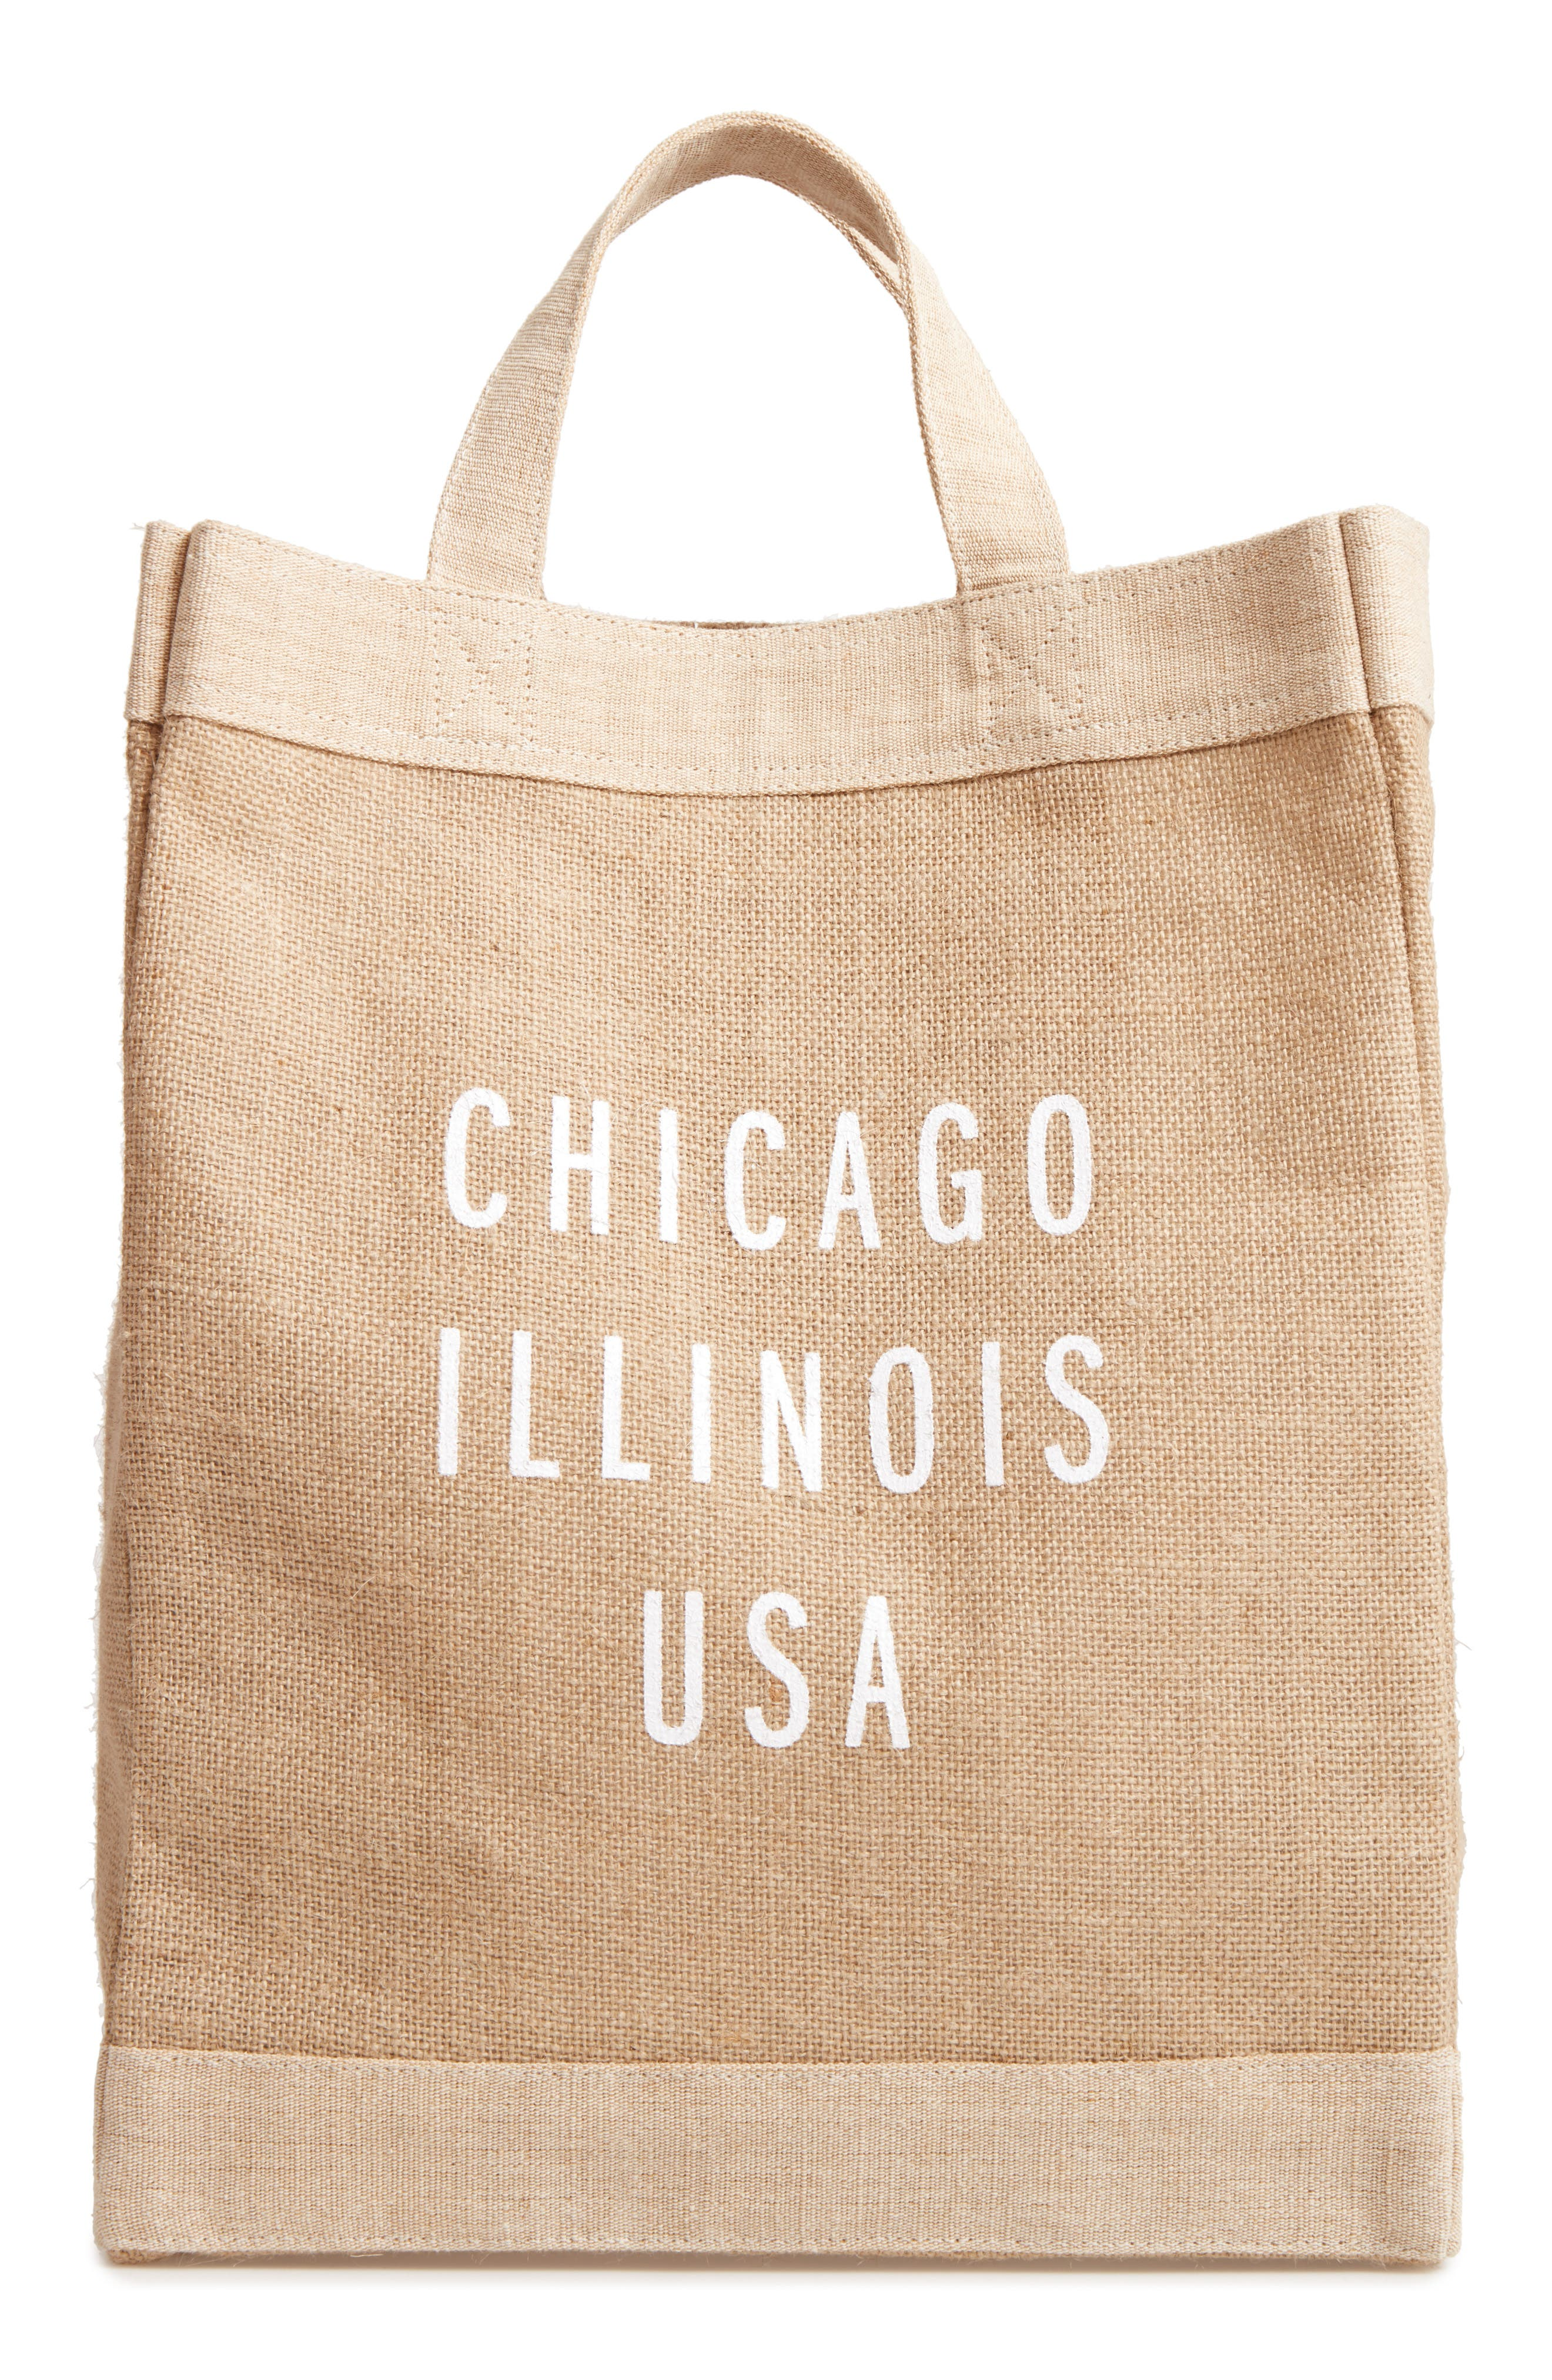 Chicago Simple Market Bag,                         Main,                         color,